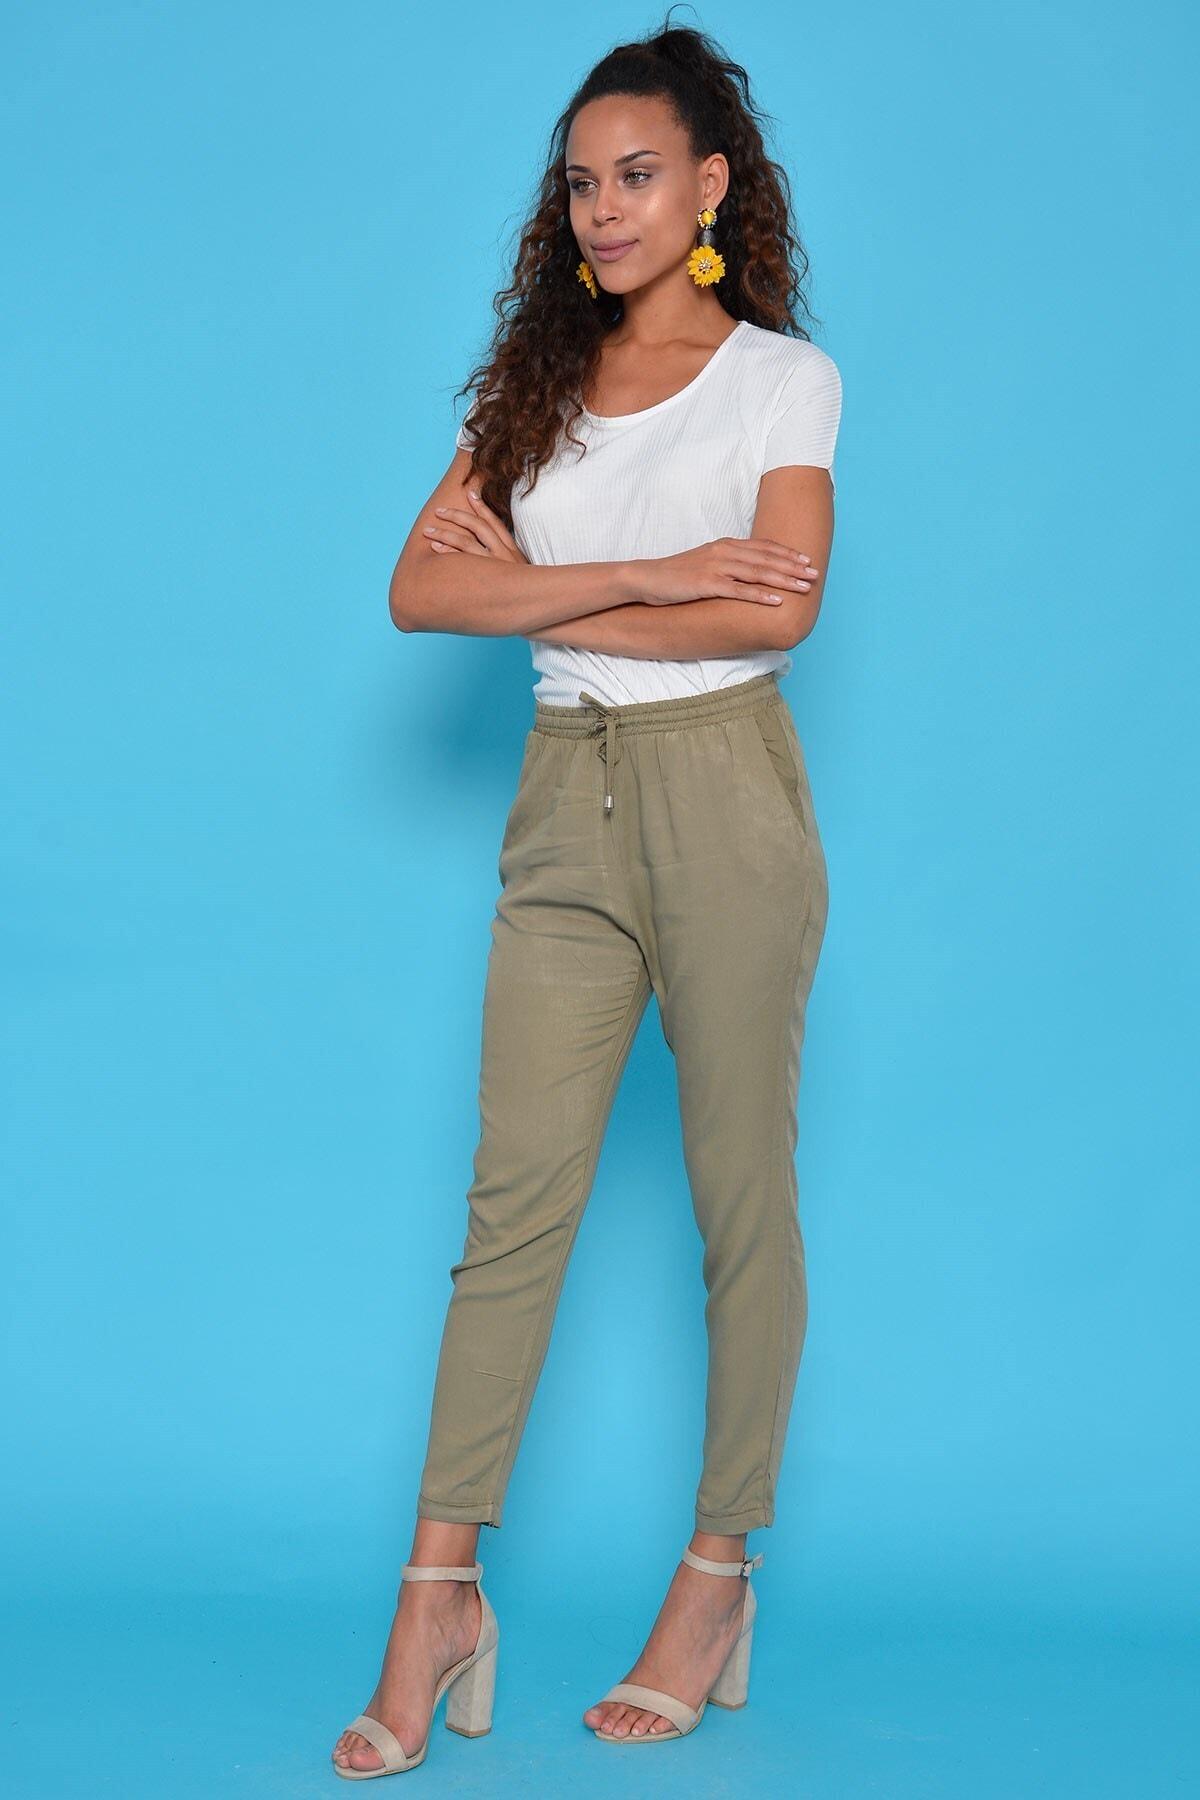 Mossta Kadın Haki Bel Lastikli Pantolon 2